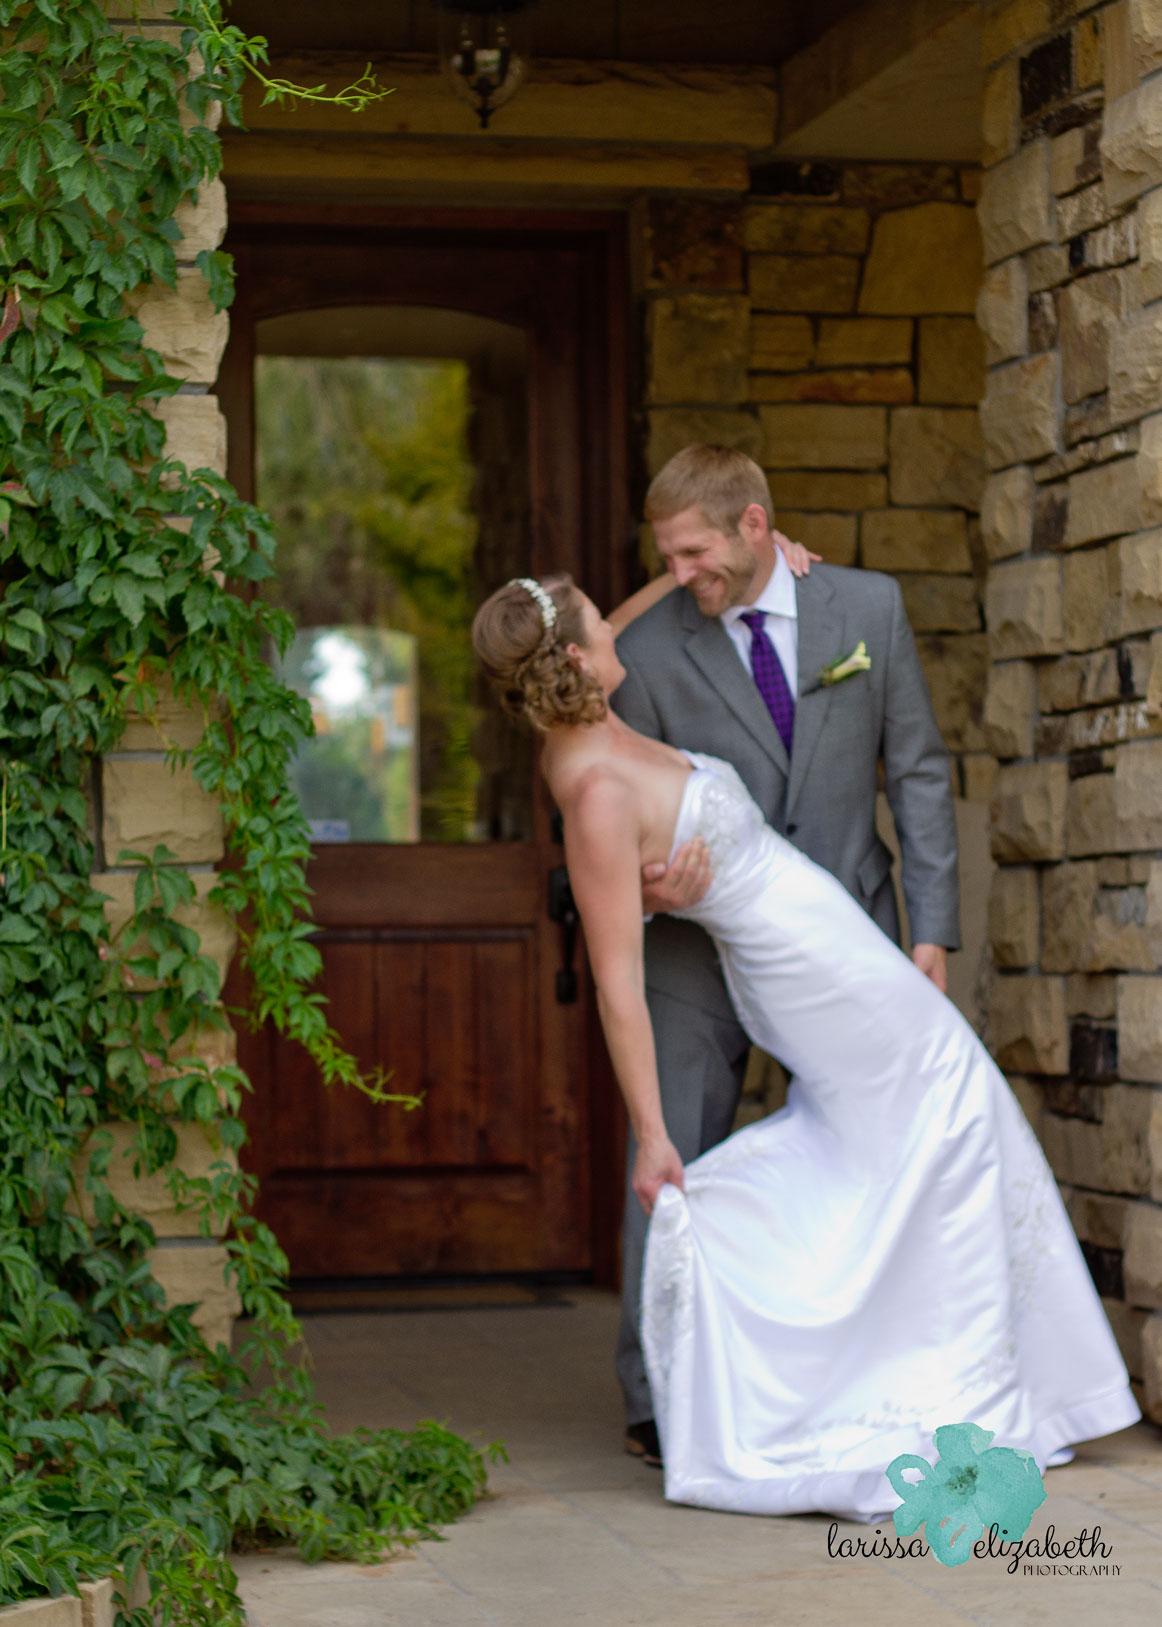 Loveland-Country-Wedding-18